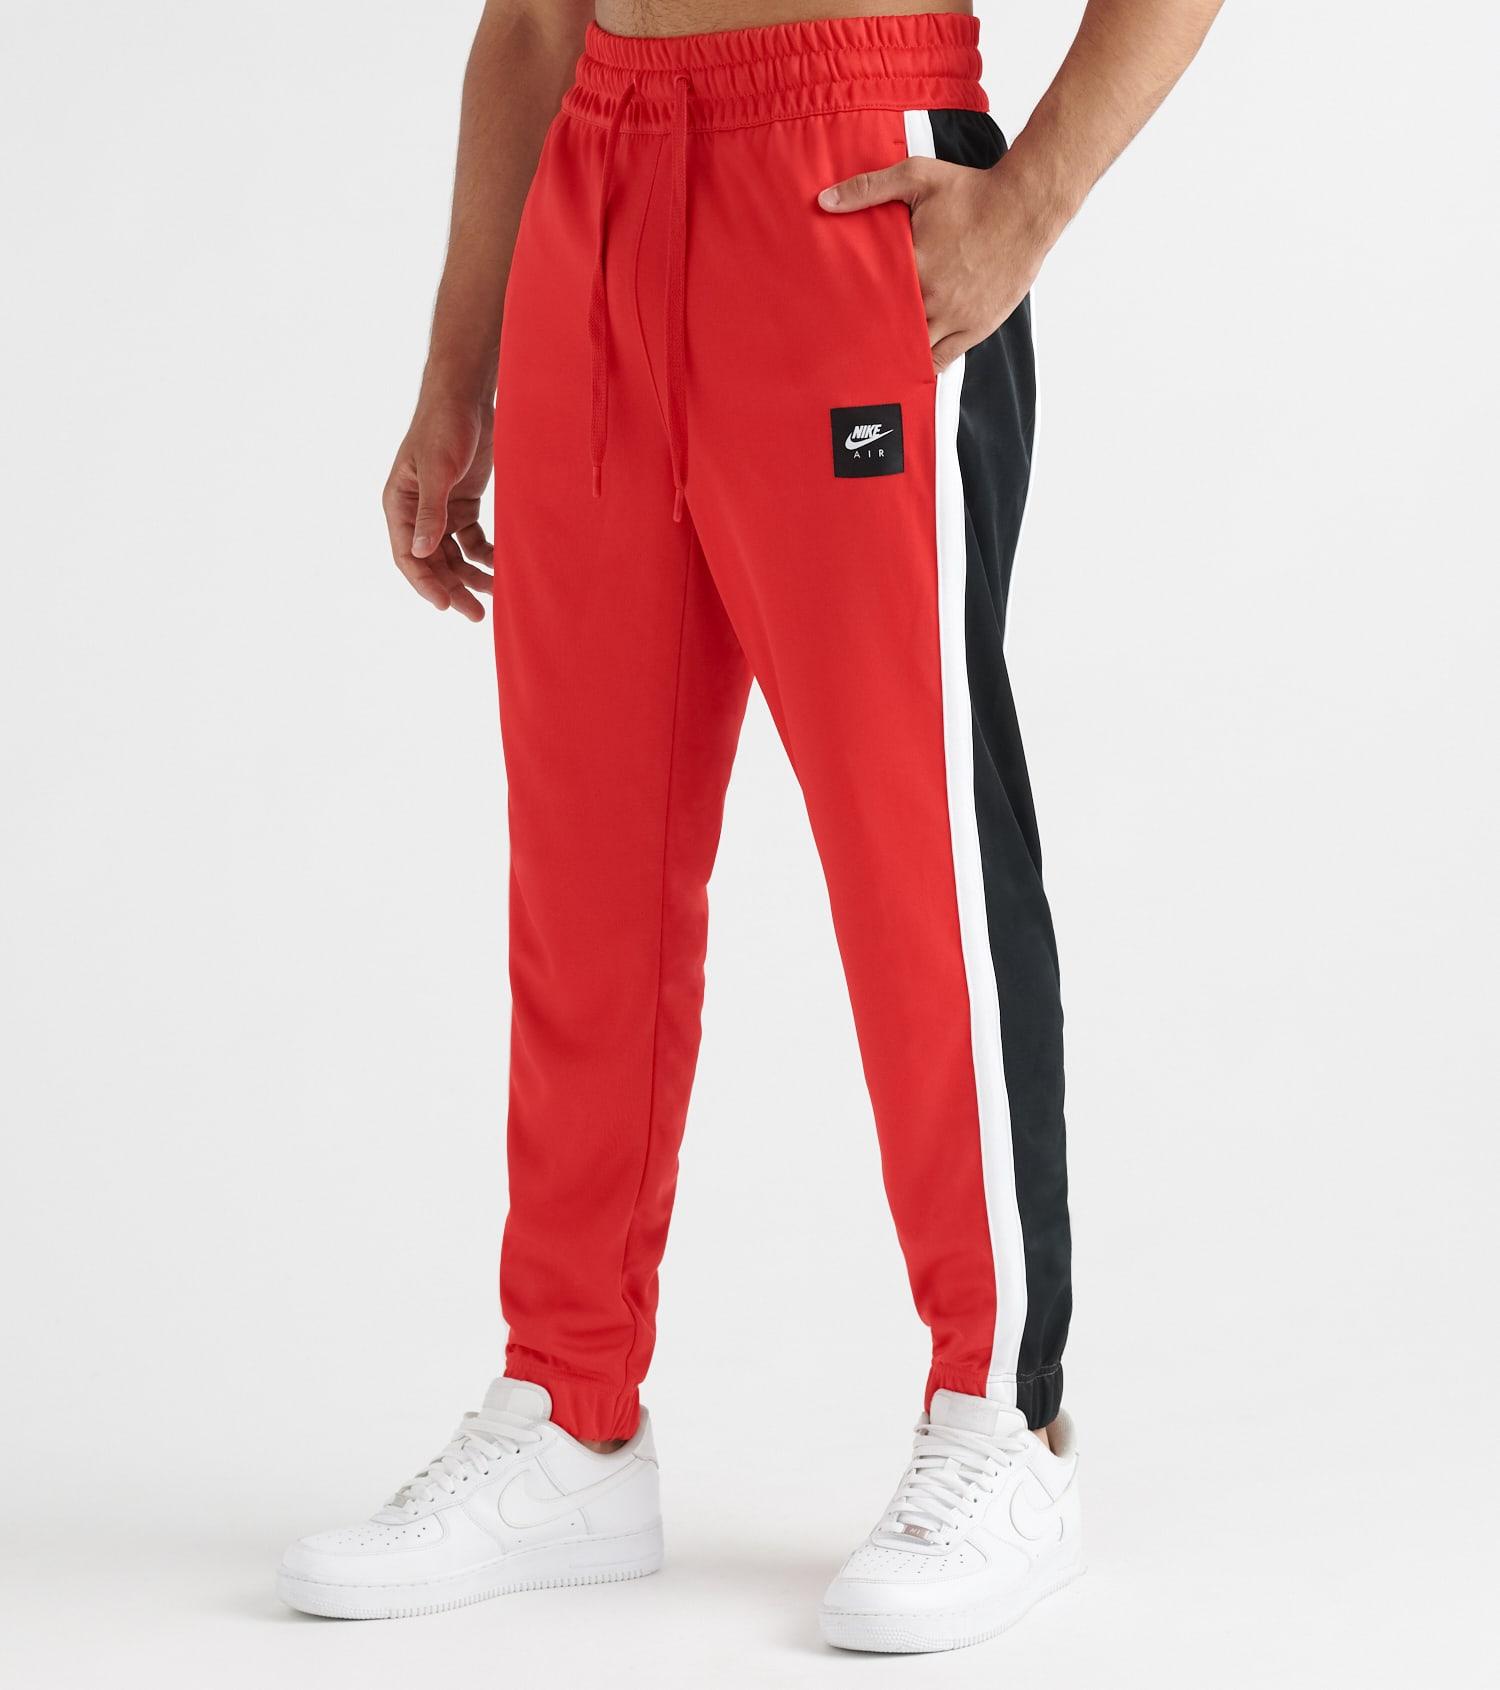 NSW Nike Air Pants PK